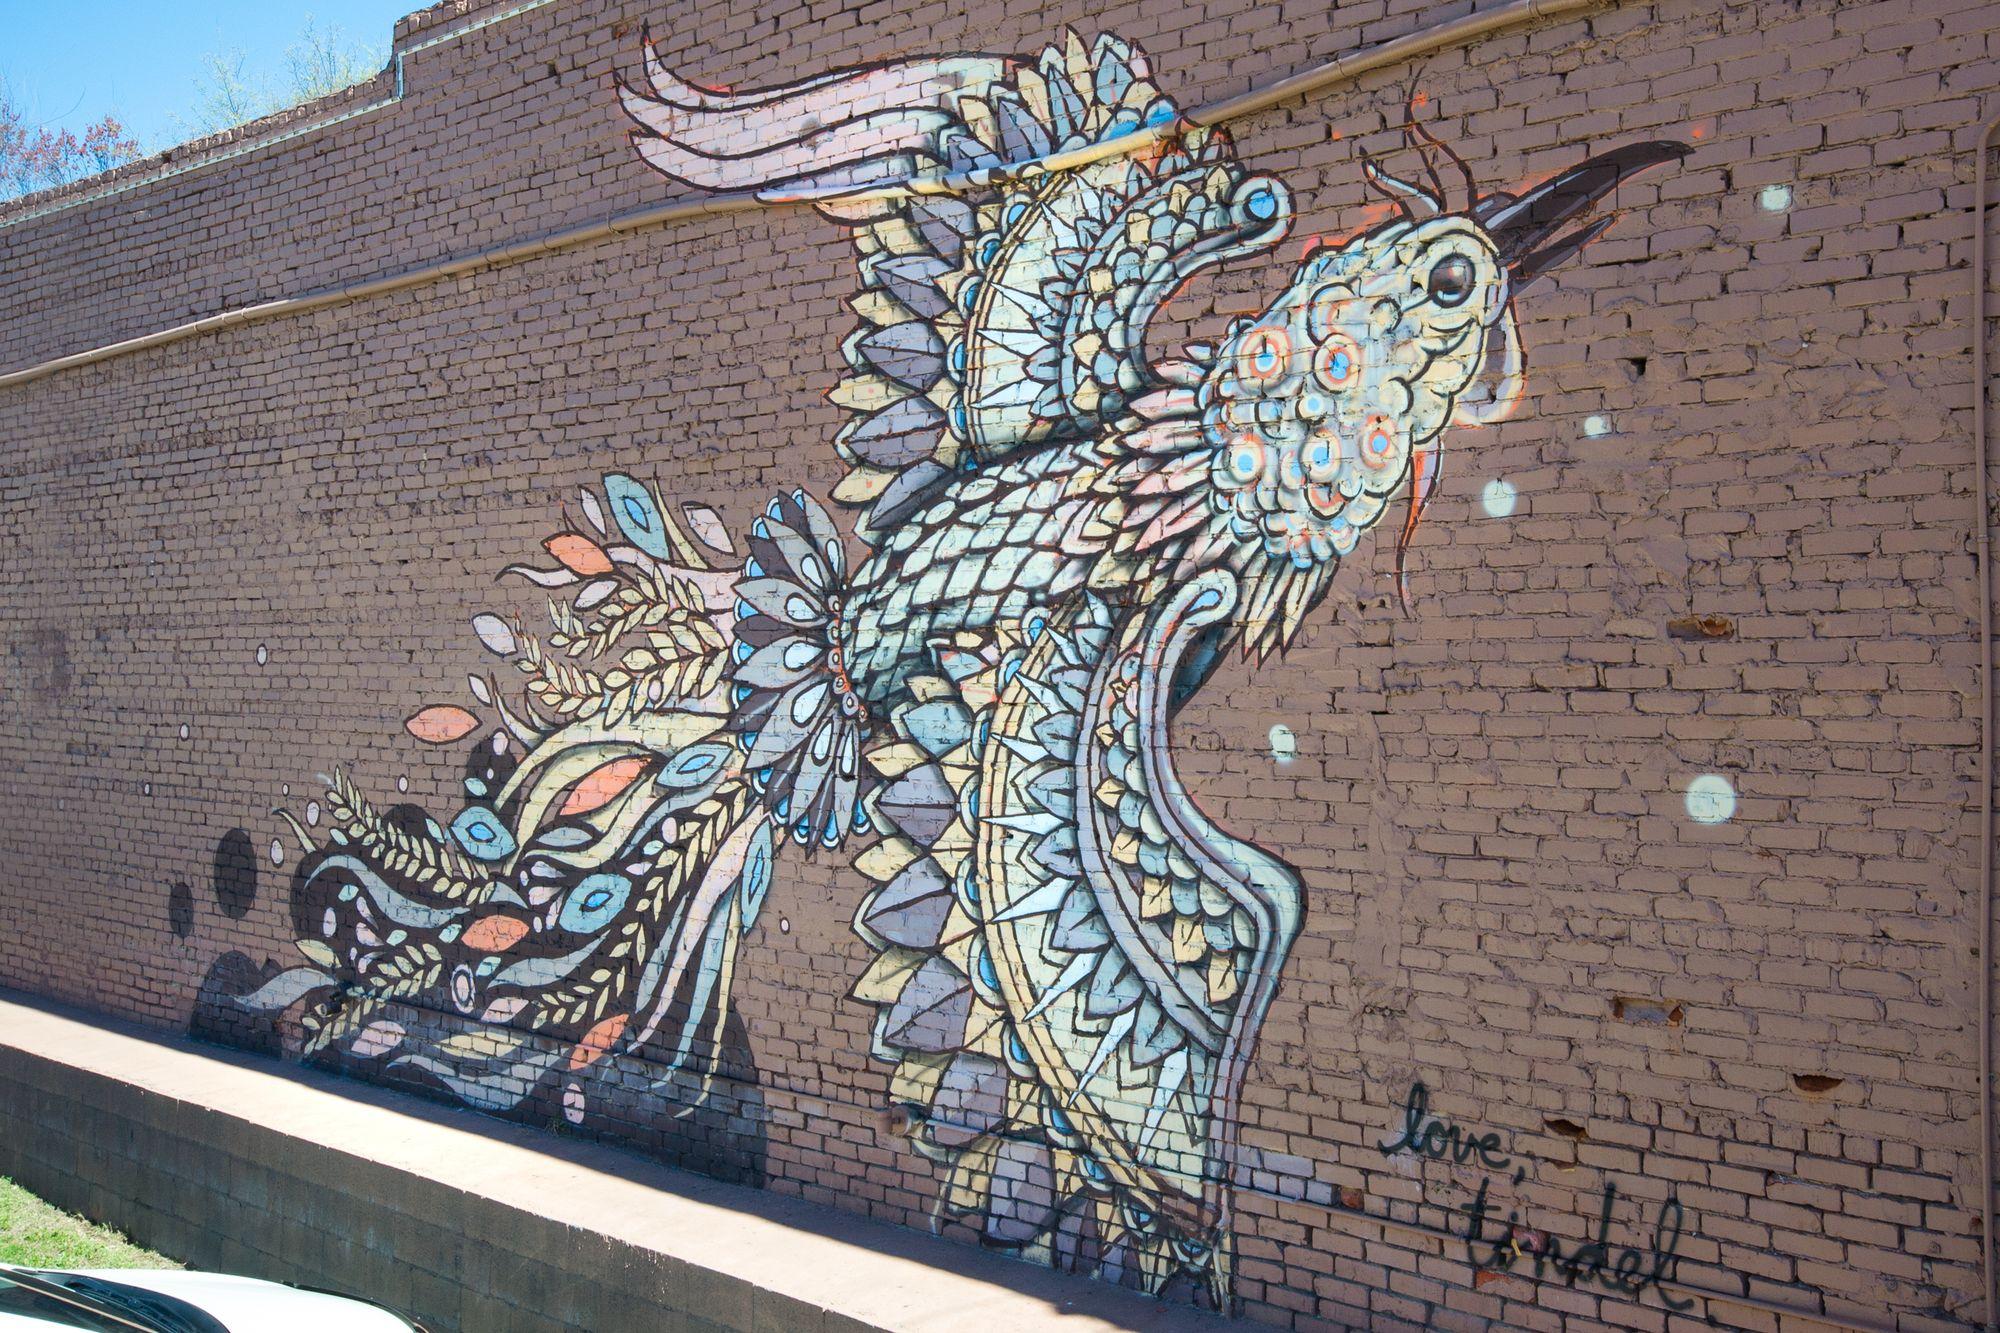 A mural by John Tindel depicting a flying bird.